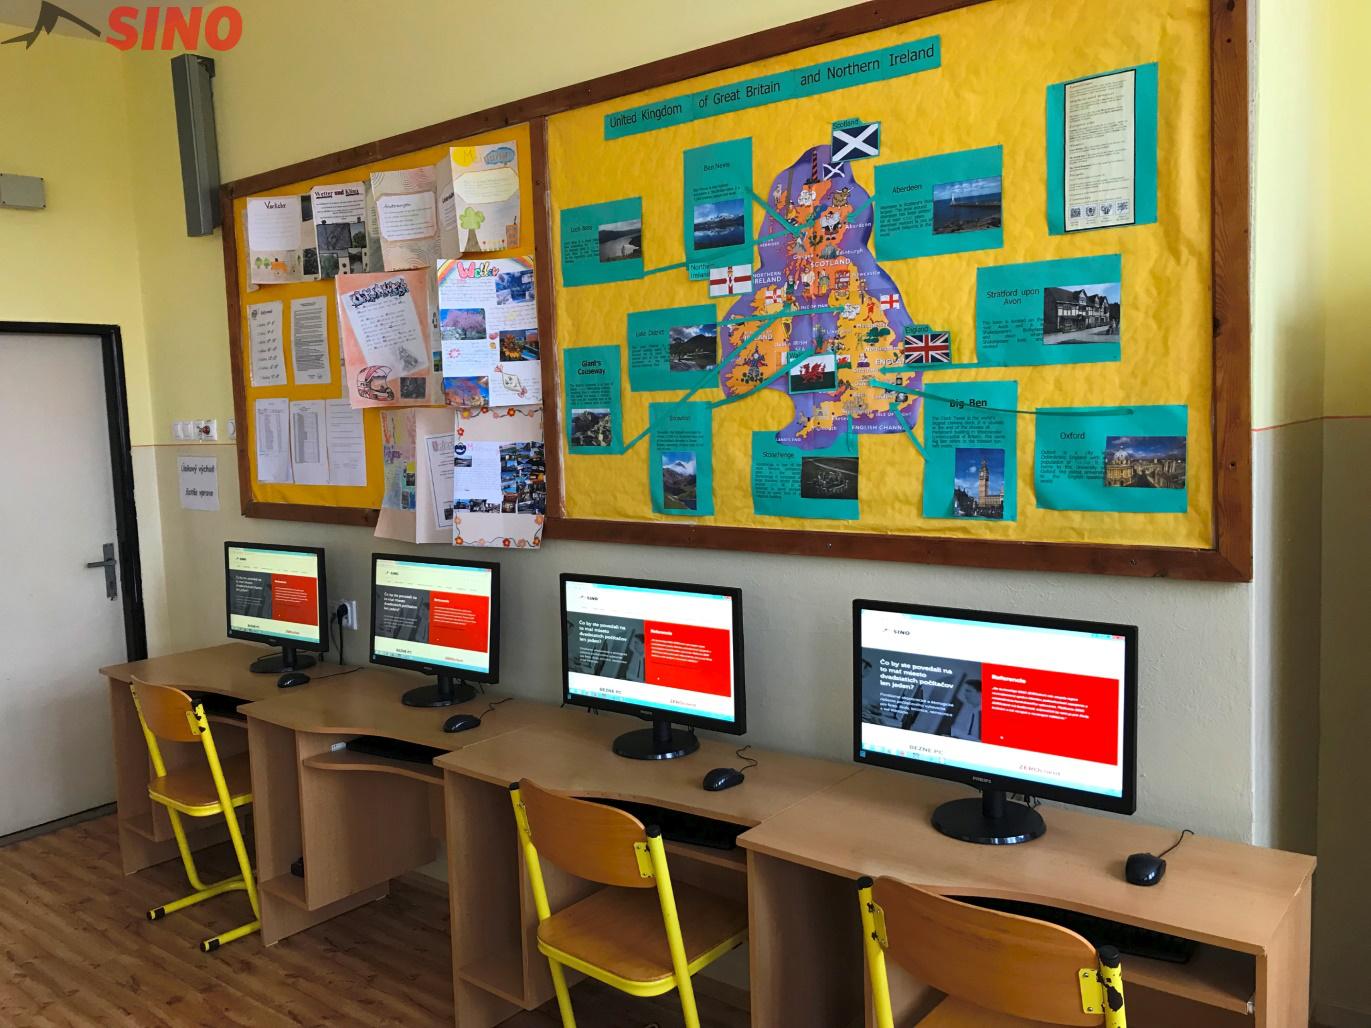 Viestova-Myjava-Elementary-School-in-Slovakia-2.png